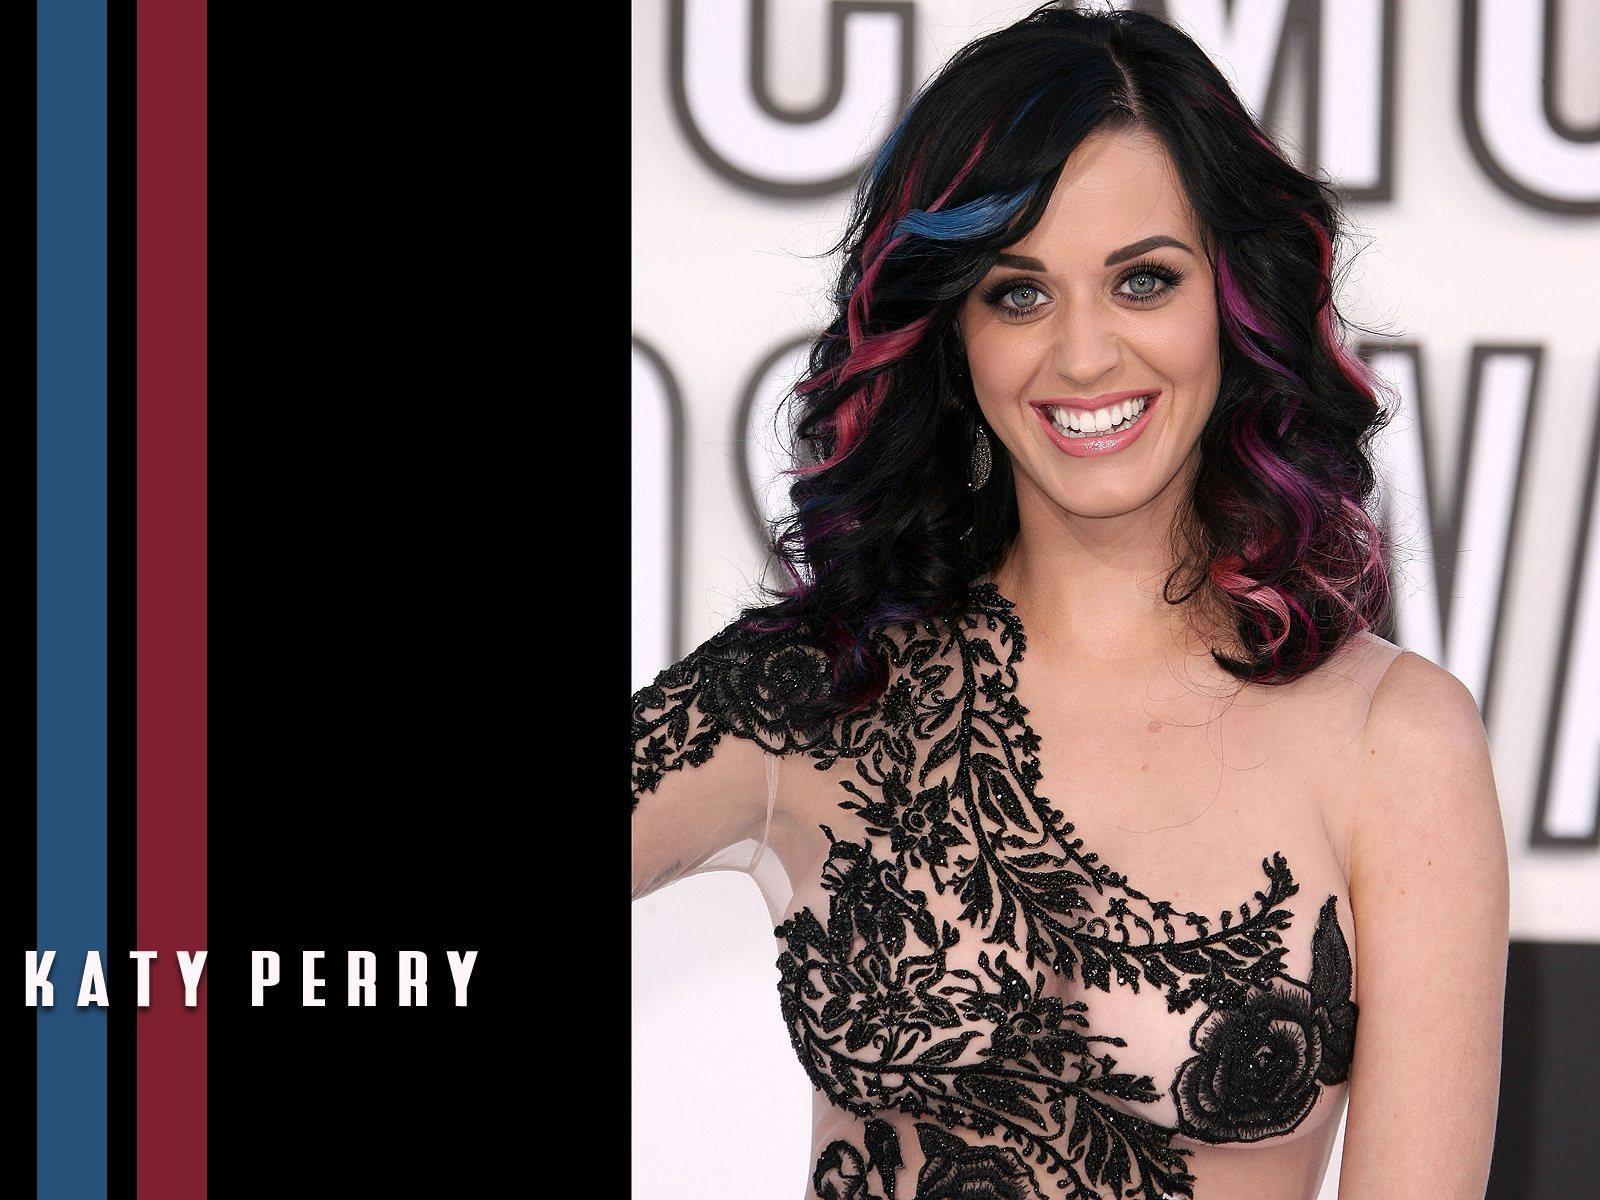 http://3.bp.blogspot.com/_EqRYU32Rb7g/TP29cghKr6I/AAAAAAAAAQU/_PBJtpr5c3A/s1600/Katy-Perry-katy-perry-Celebrity%253D%253DDigital.jpg